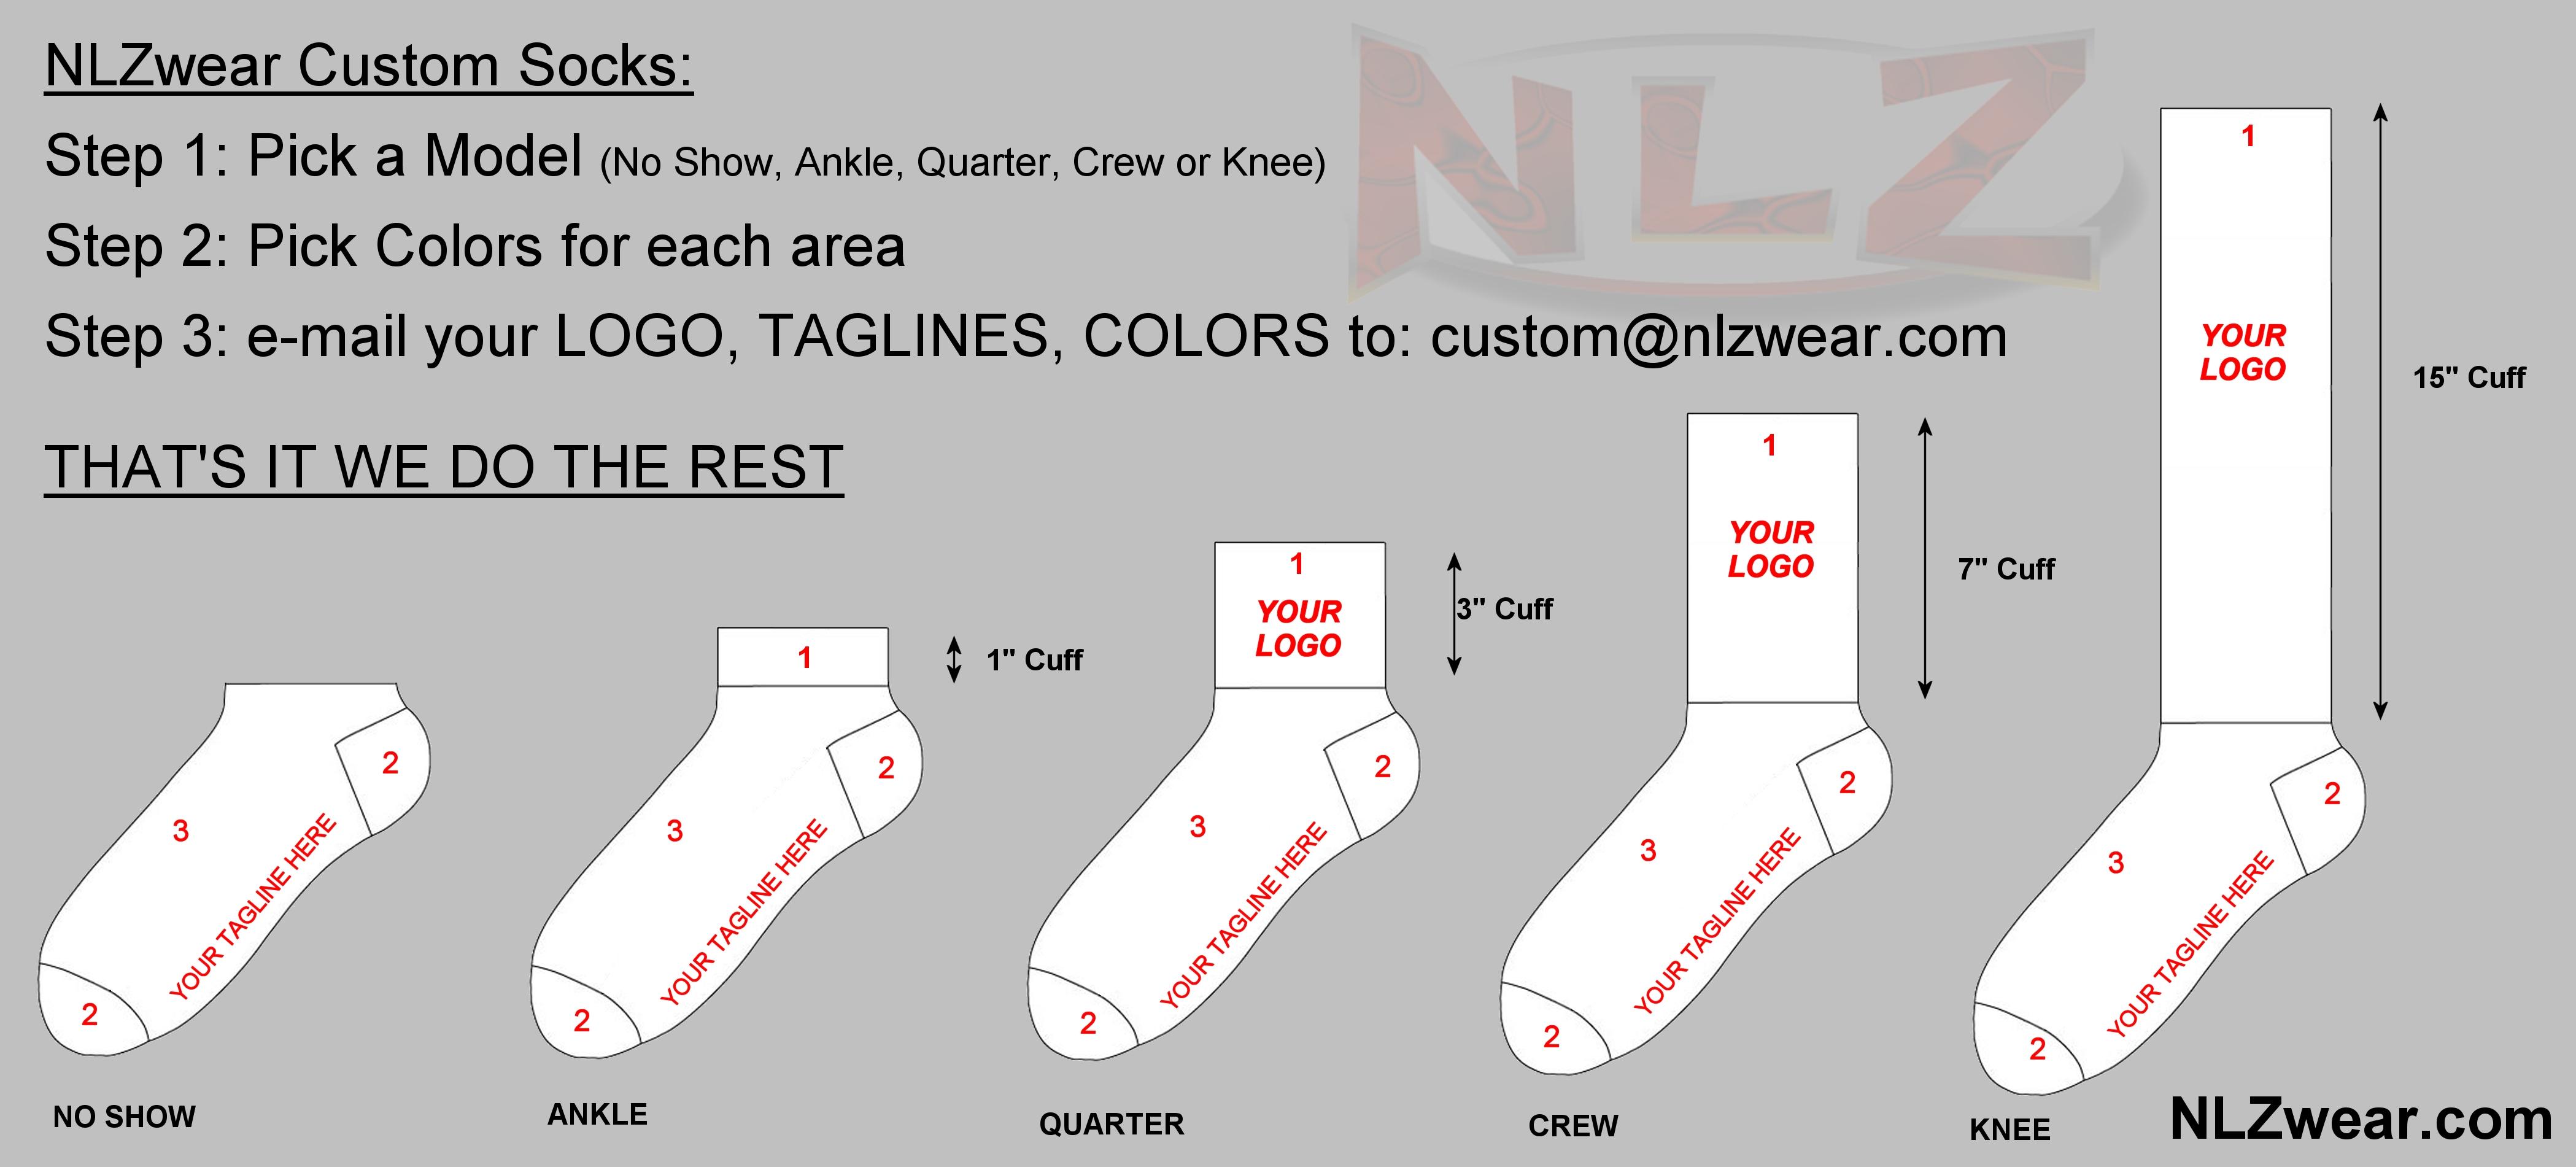 Custom basketball socks nlzwear custom socks maxwellsz